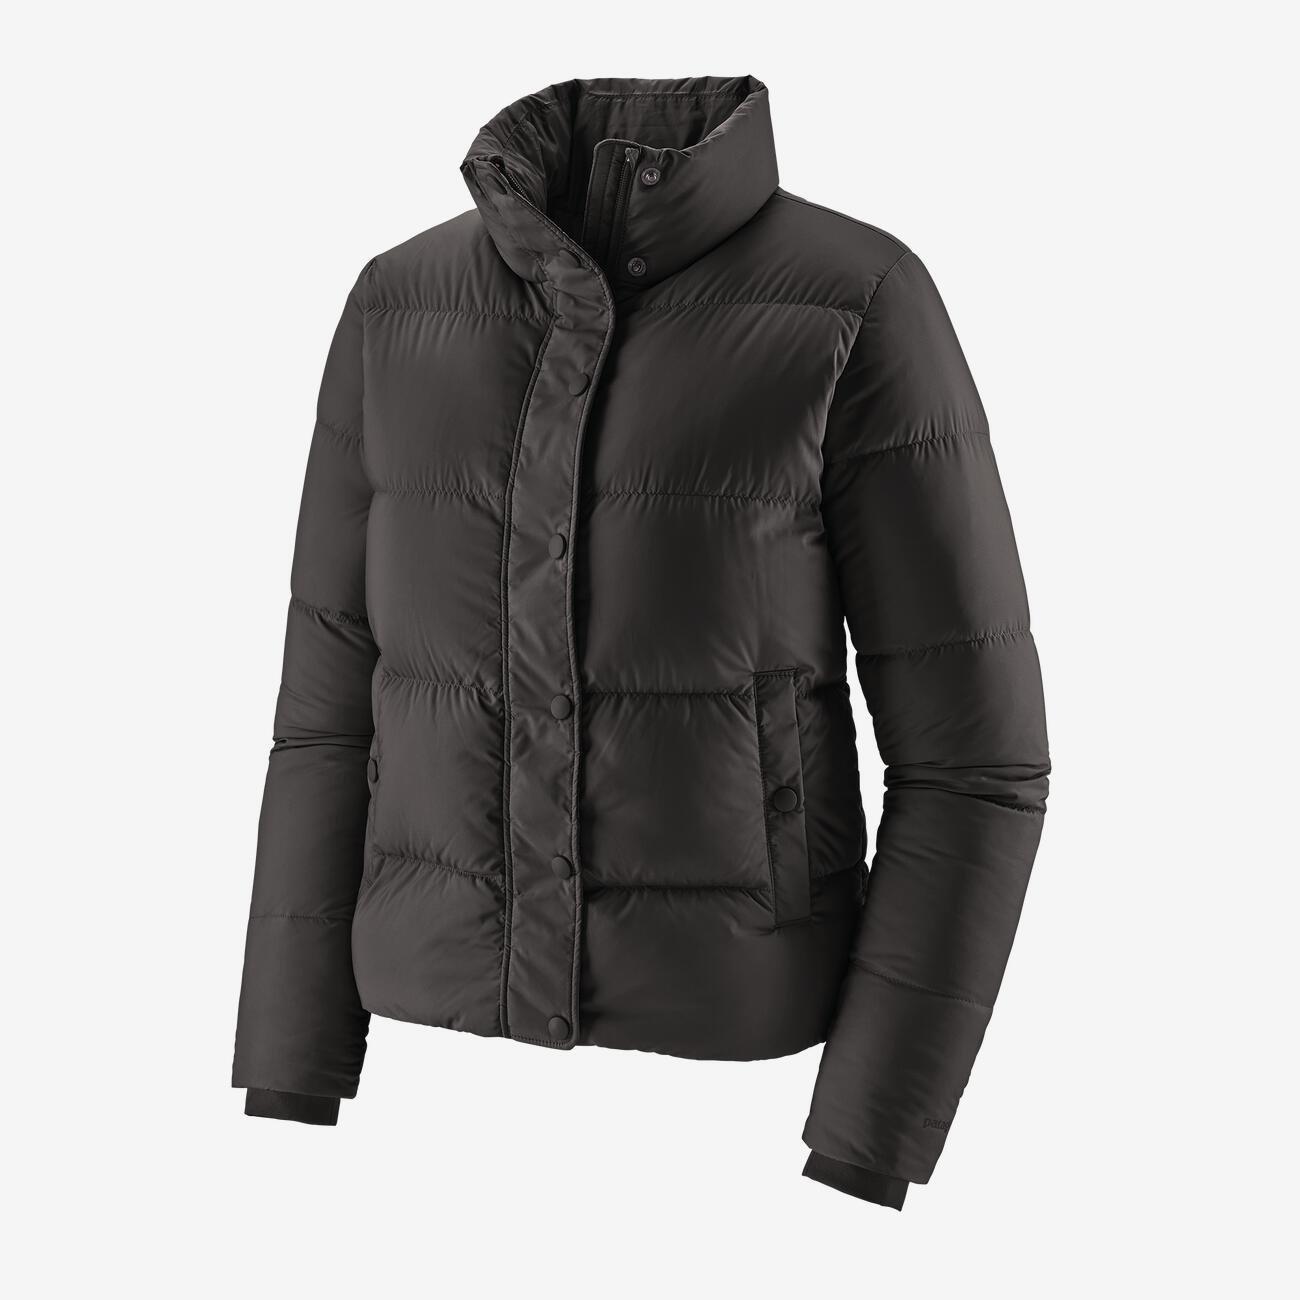 W's Patagonia Silent Down Jacket in Black